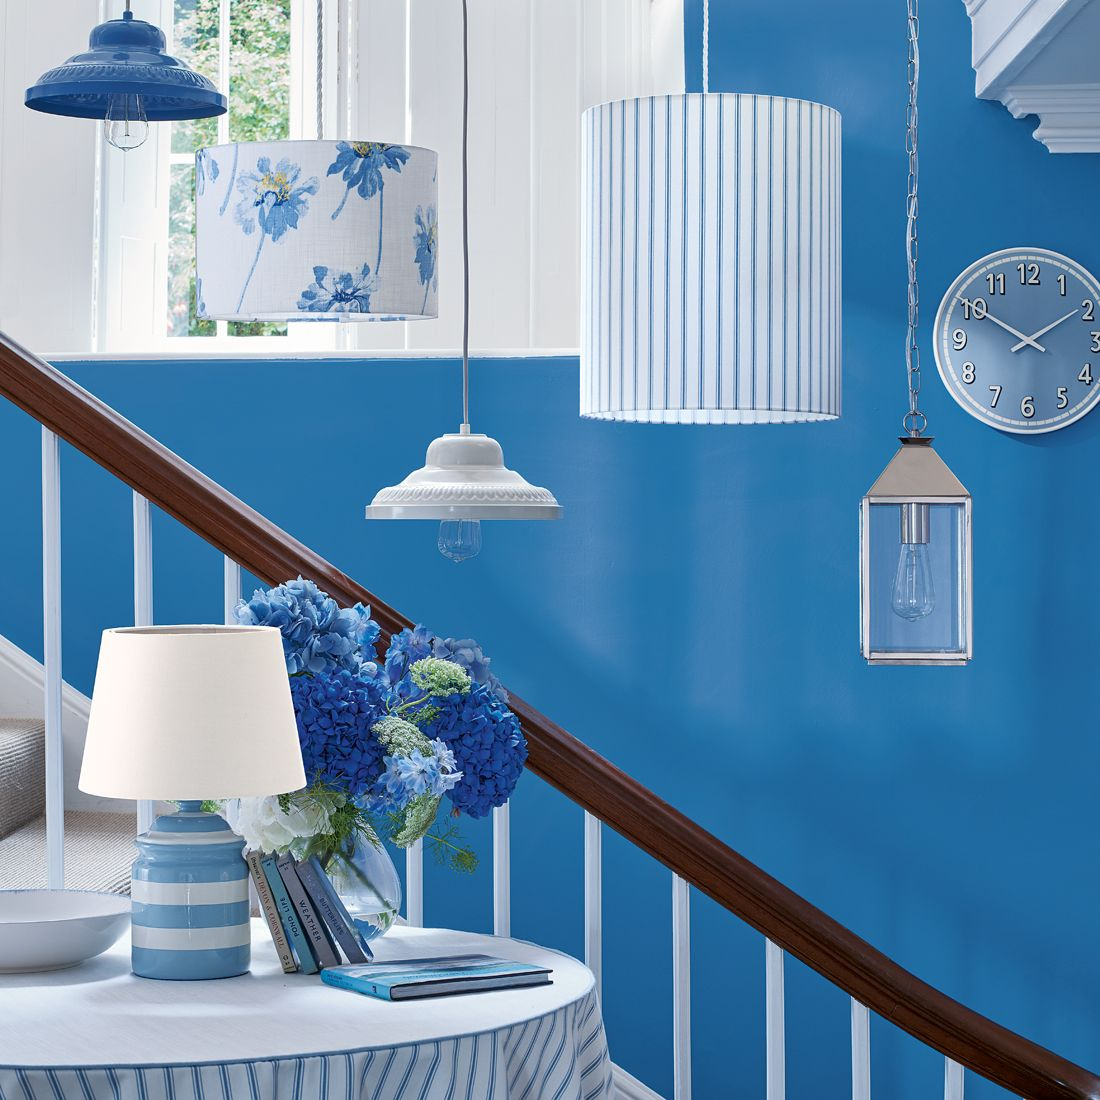 Interior Design Inspiration Photos By Laura Hay Decor Design: Laura Ashley Lighting Range